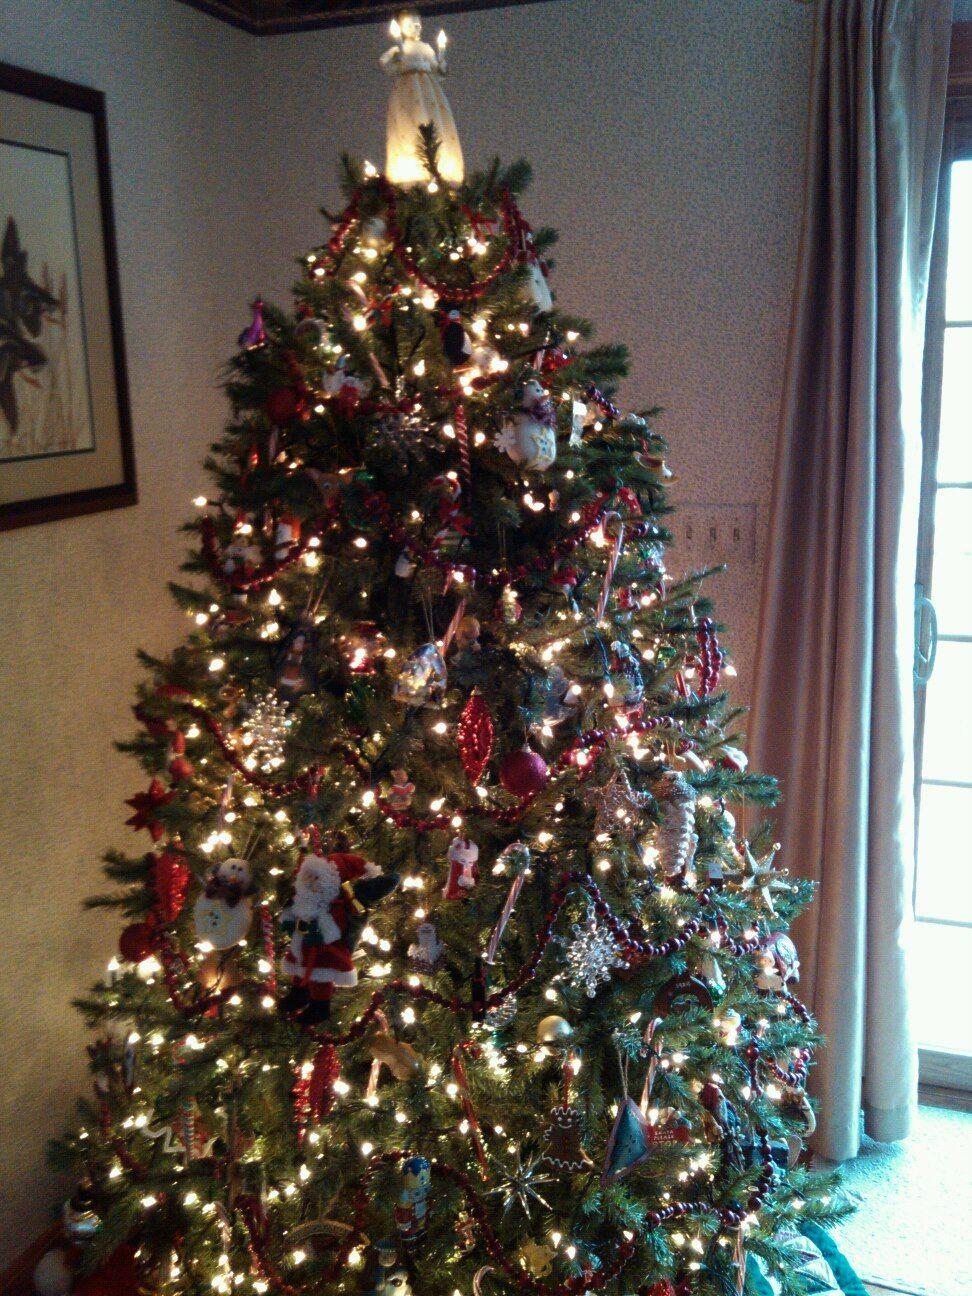 Sweepstakes Country Living Live Christmas Trees Christmas Tree Christmas Tree Decorations